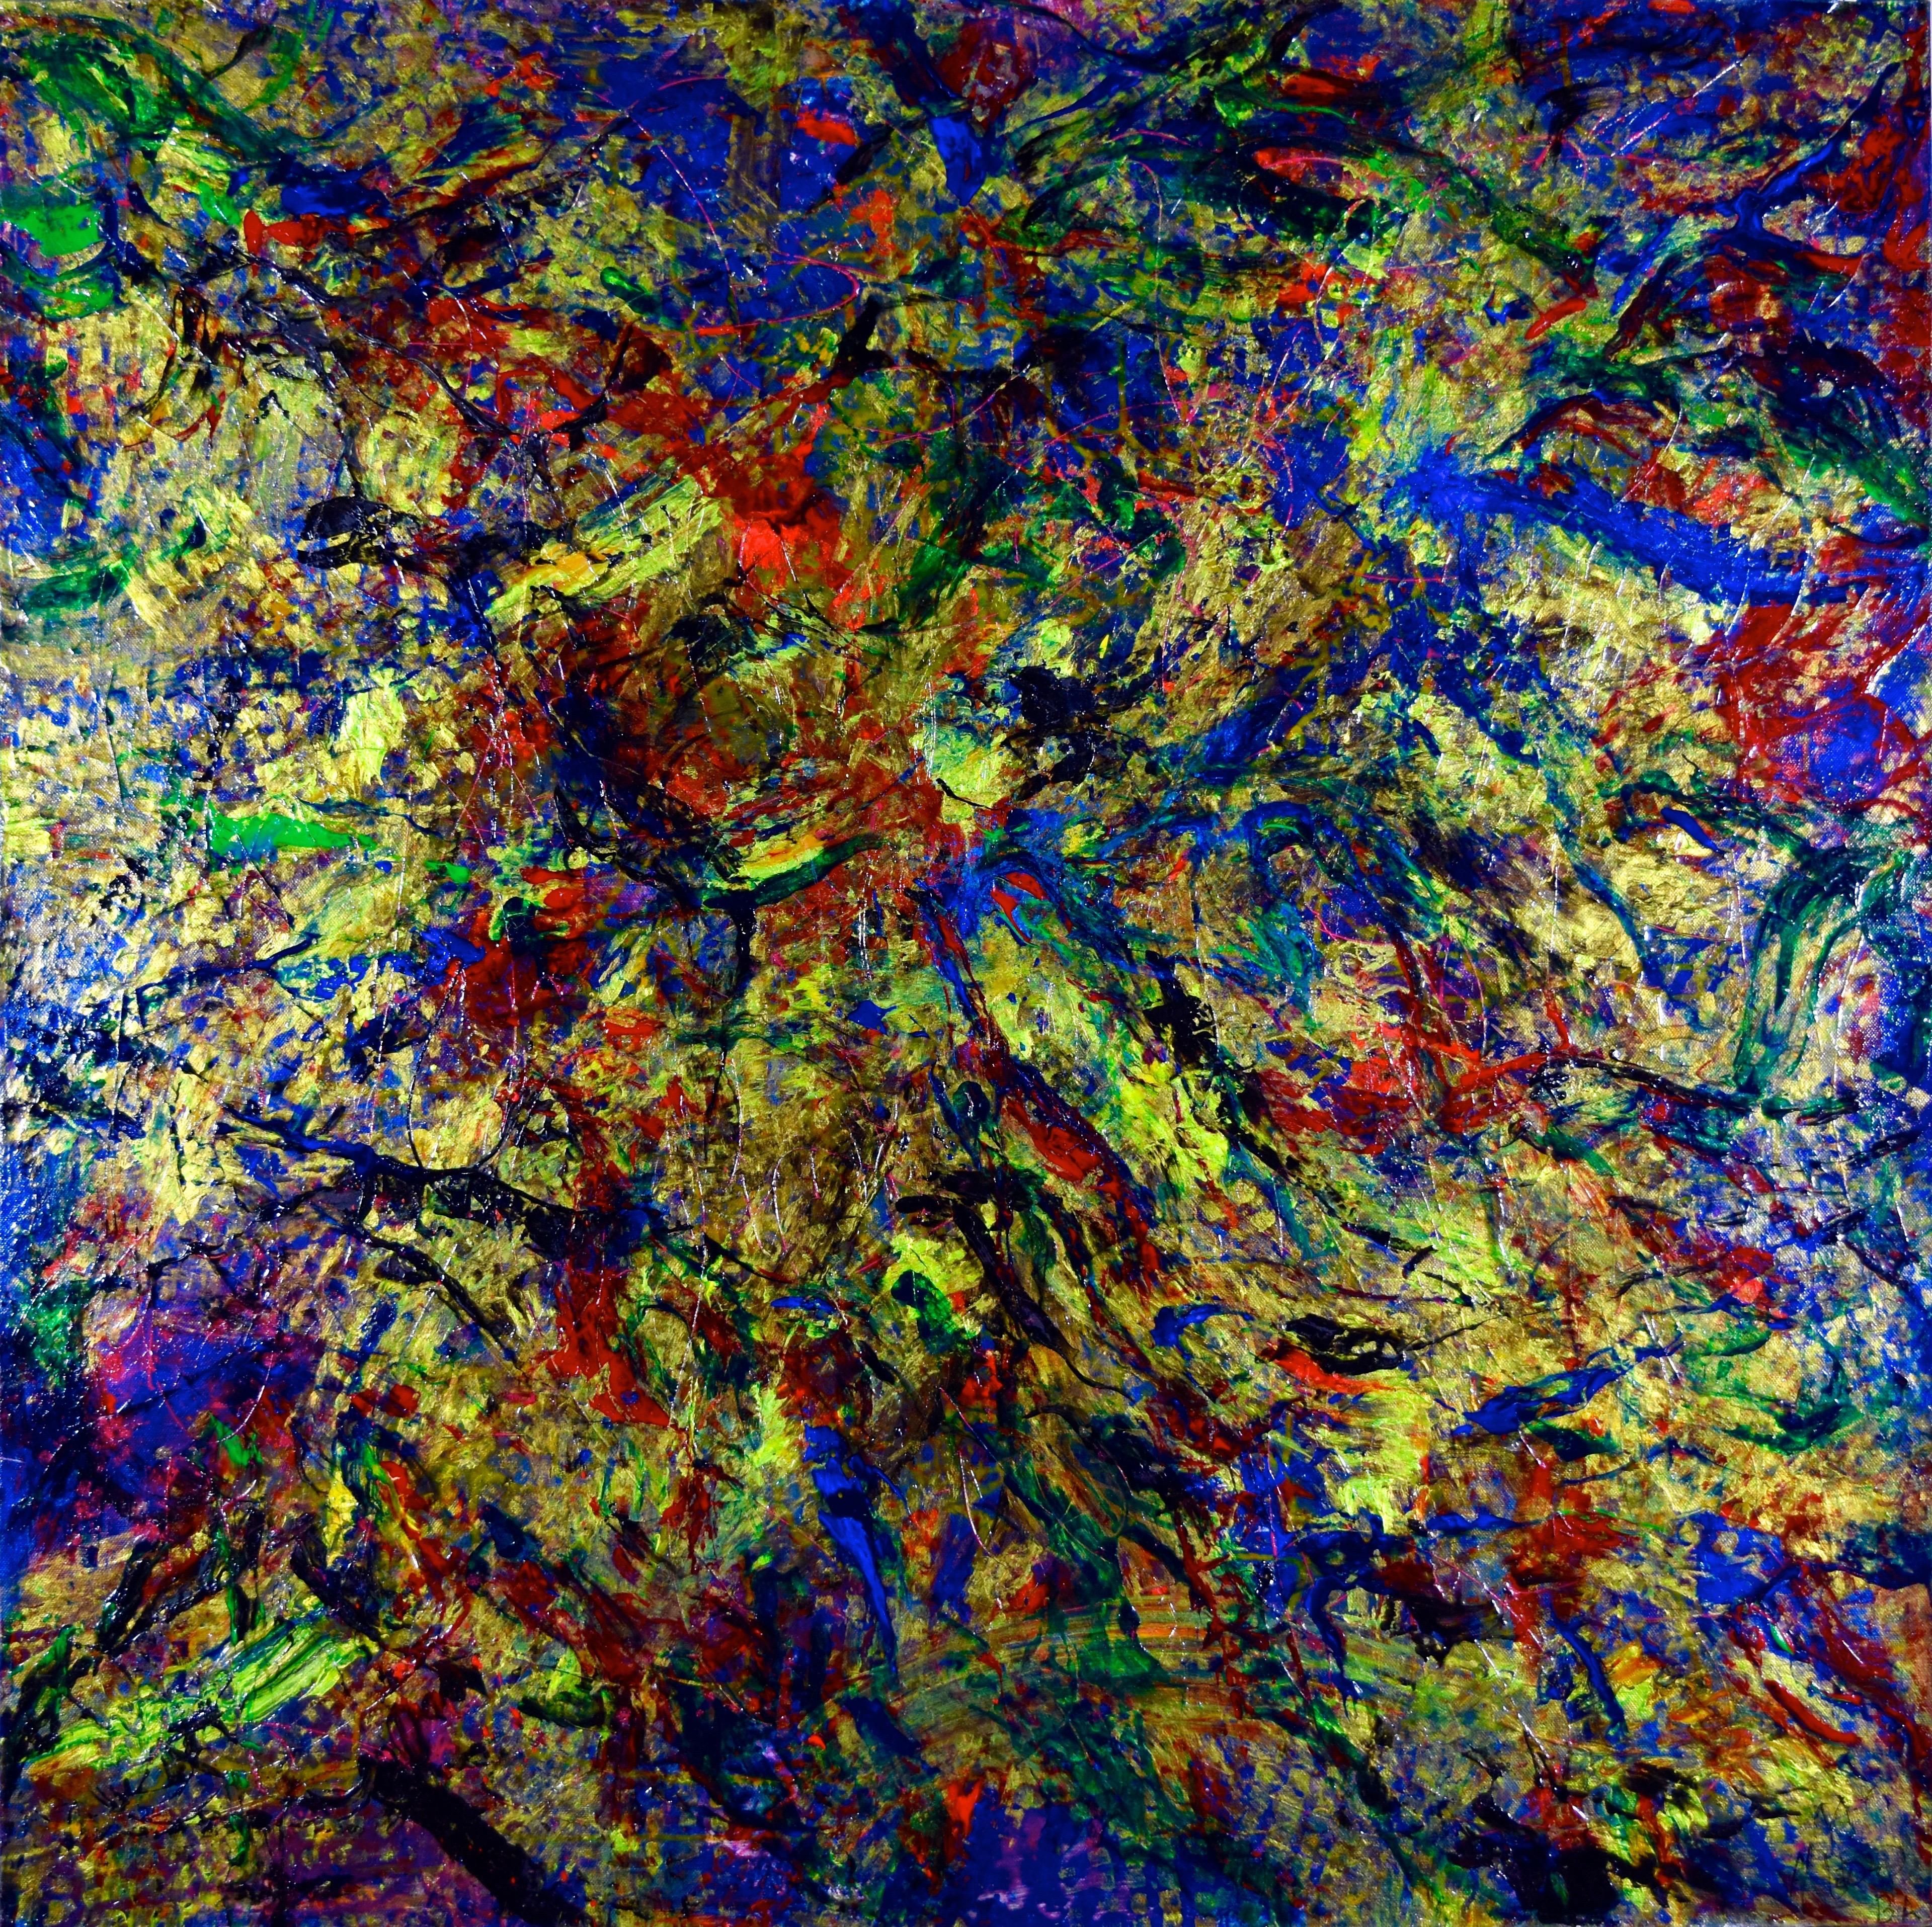 Foresta (2013) Acrylic painting by Nestor Toro